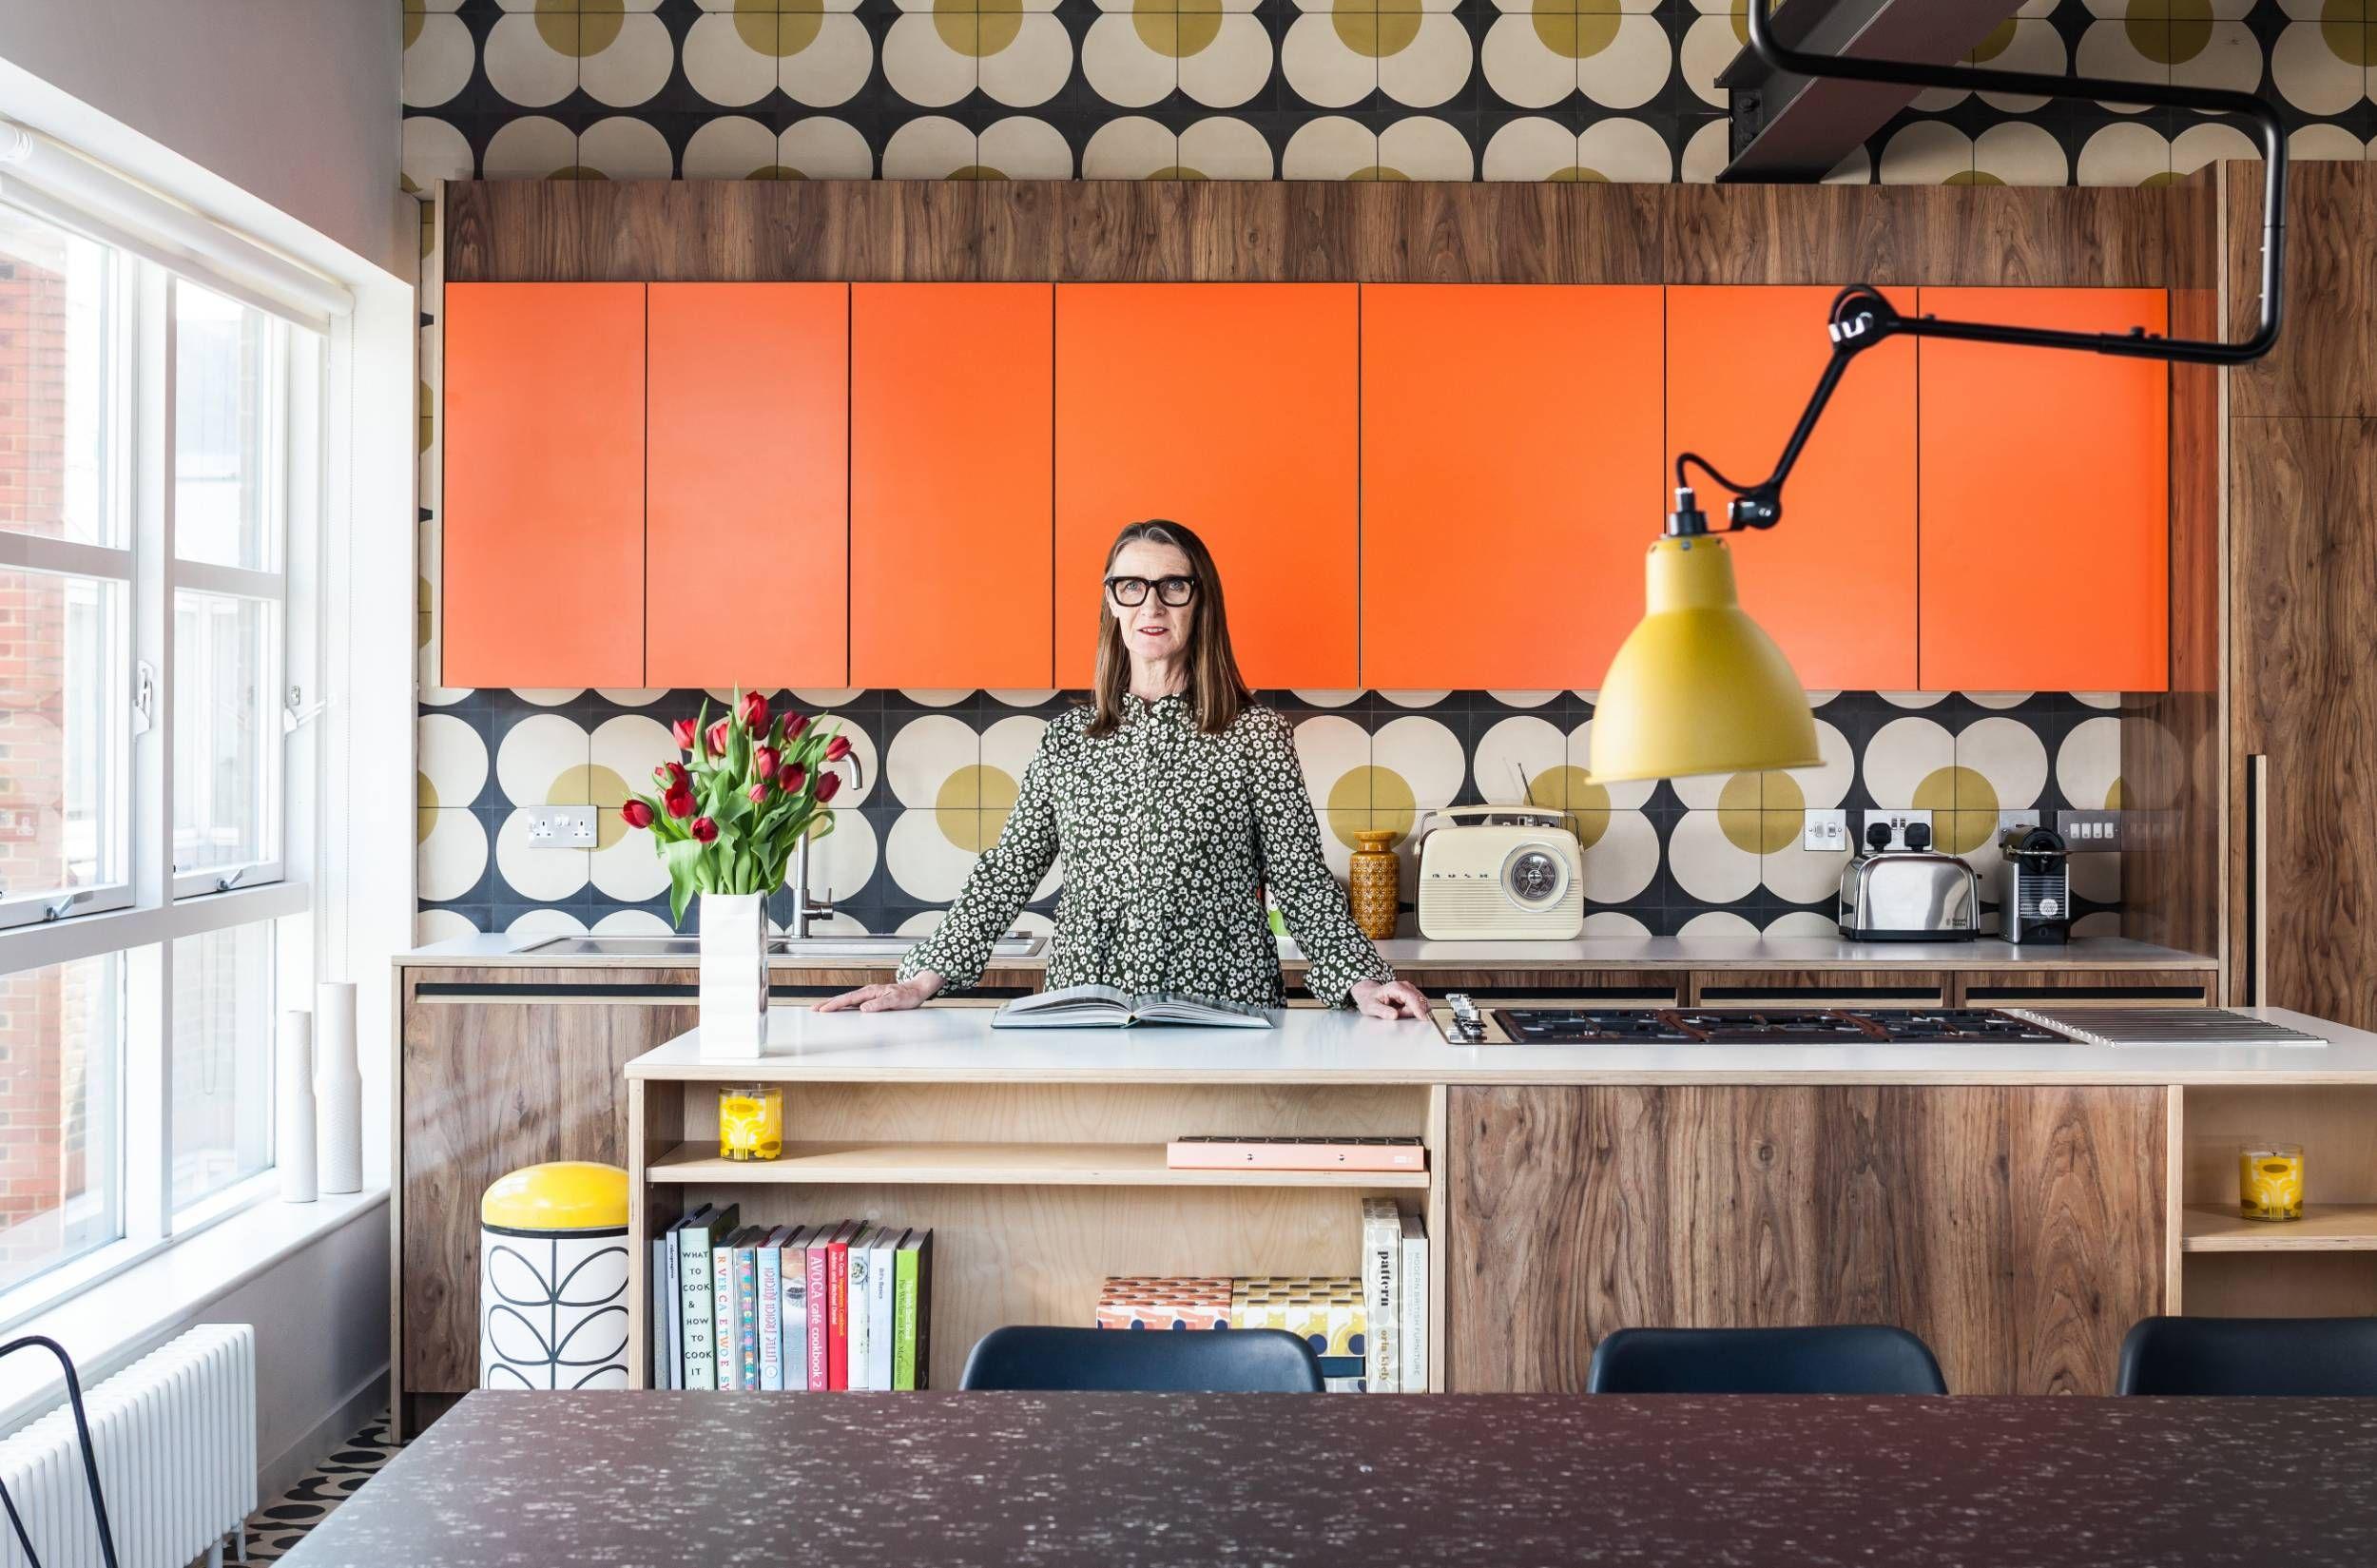 See inside designer Orla Kiely's riotously patterned